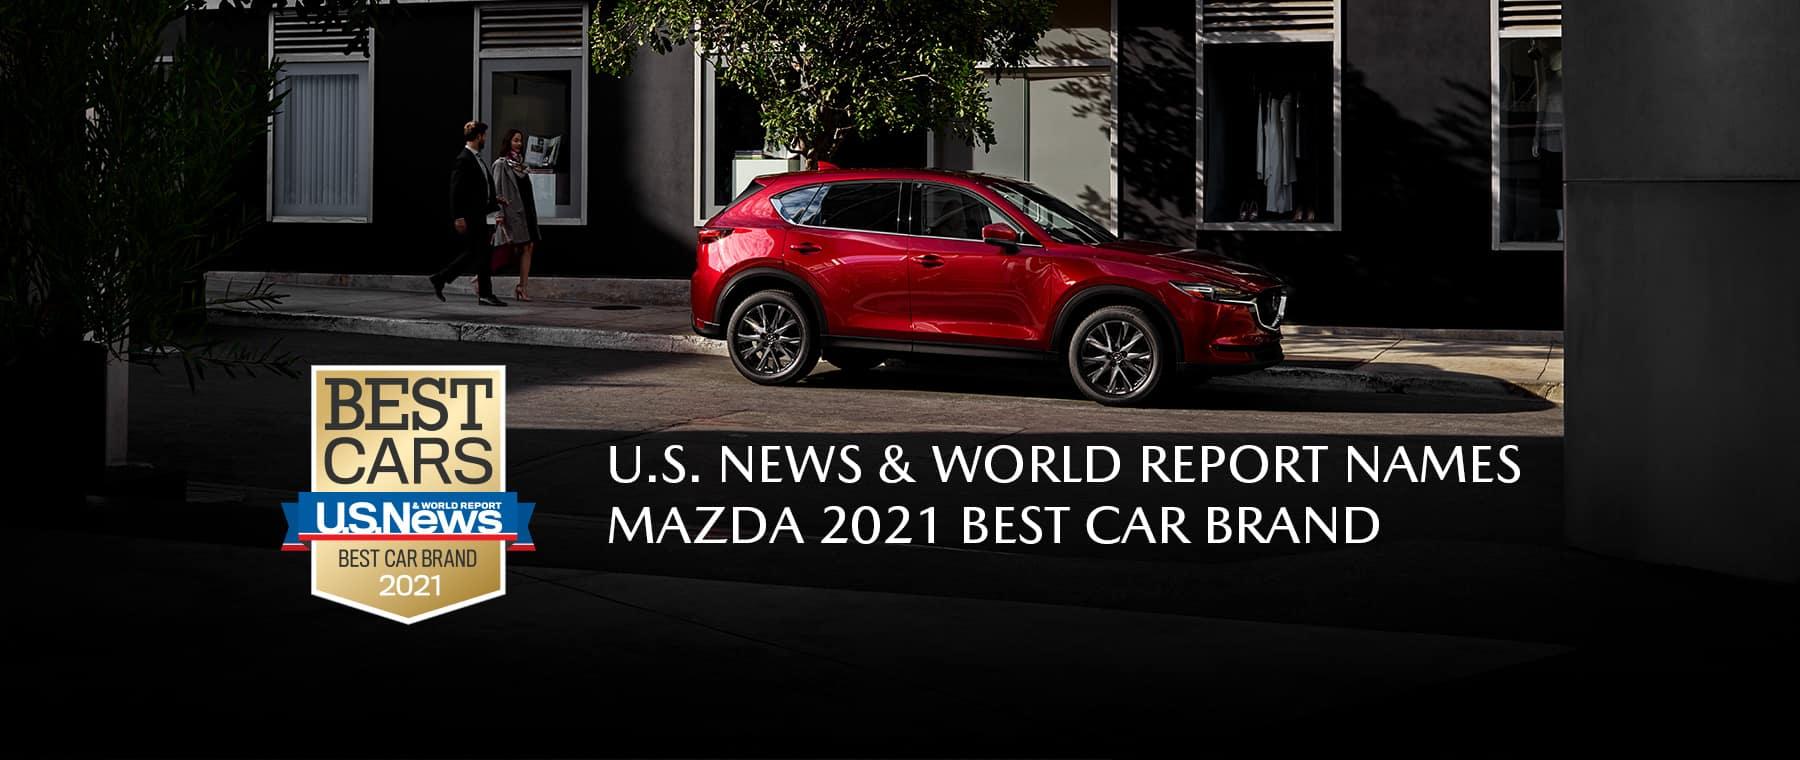 Mazda_USBestCarBrand-_1800x760